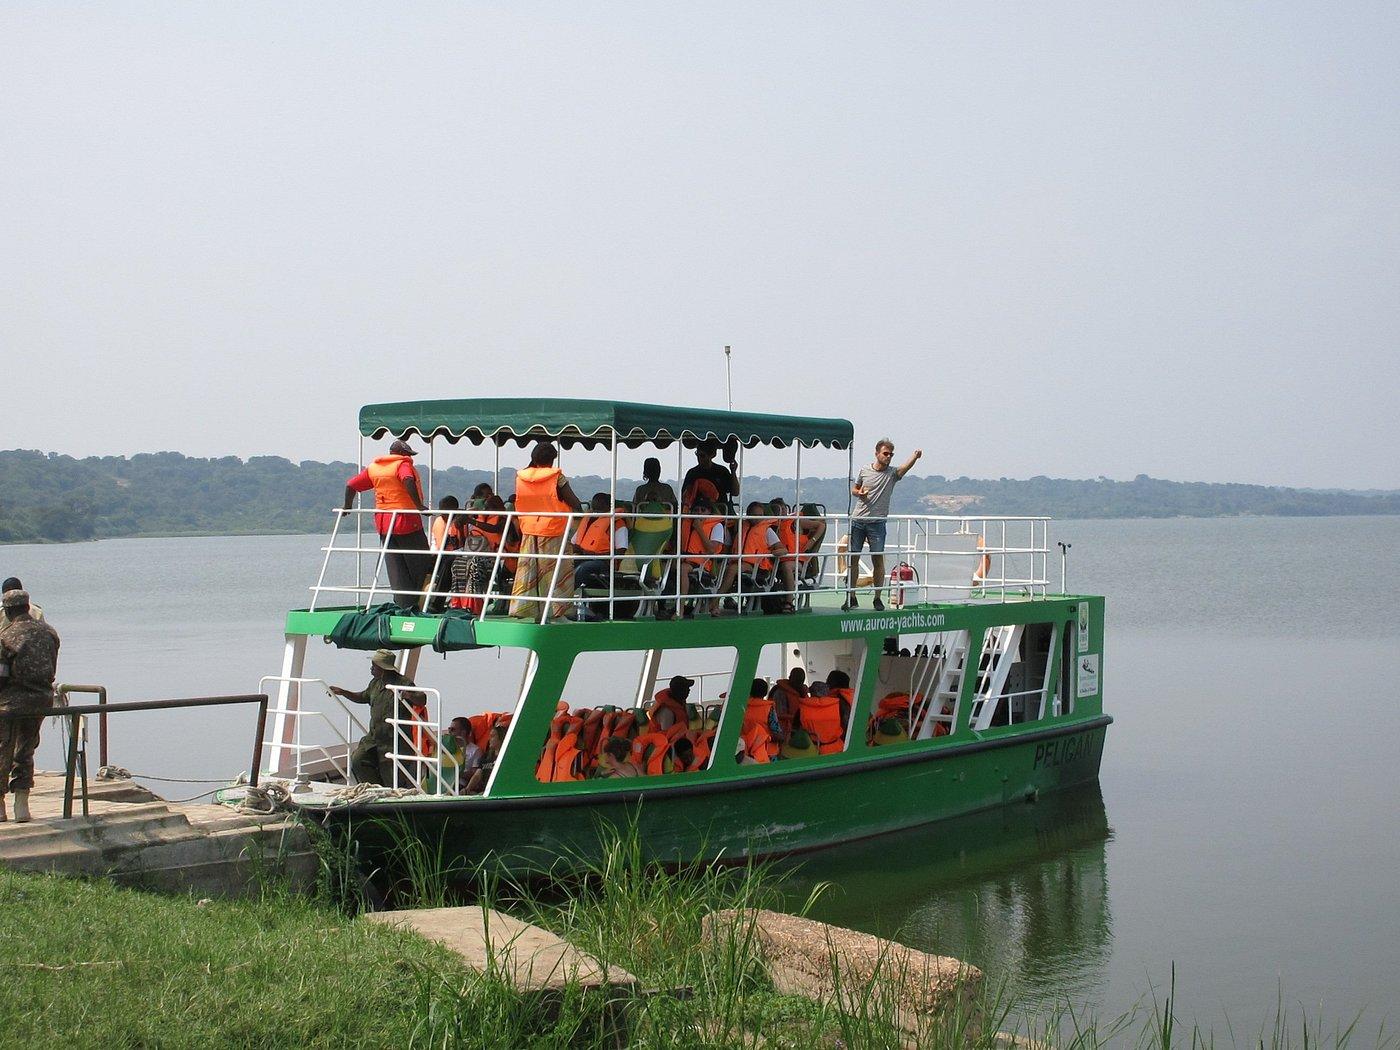 Boat Cruise in Queen Elizabeth National Park